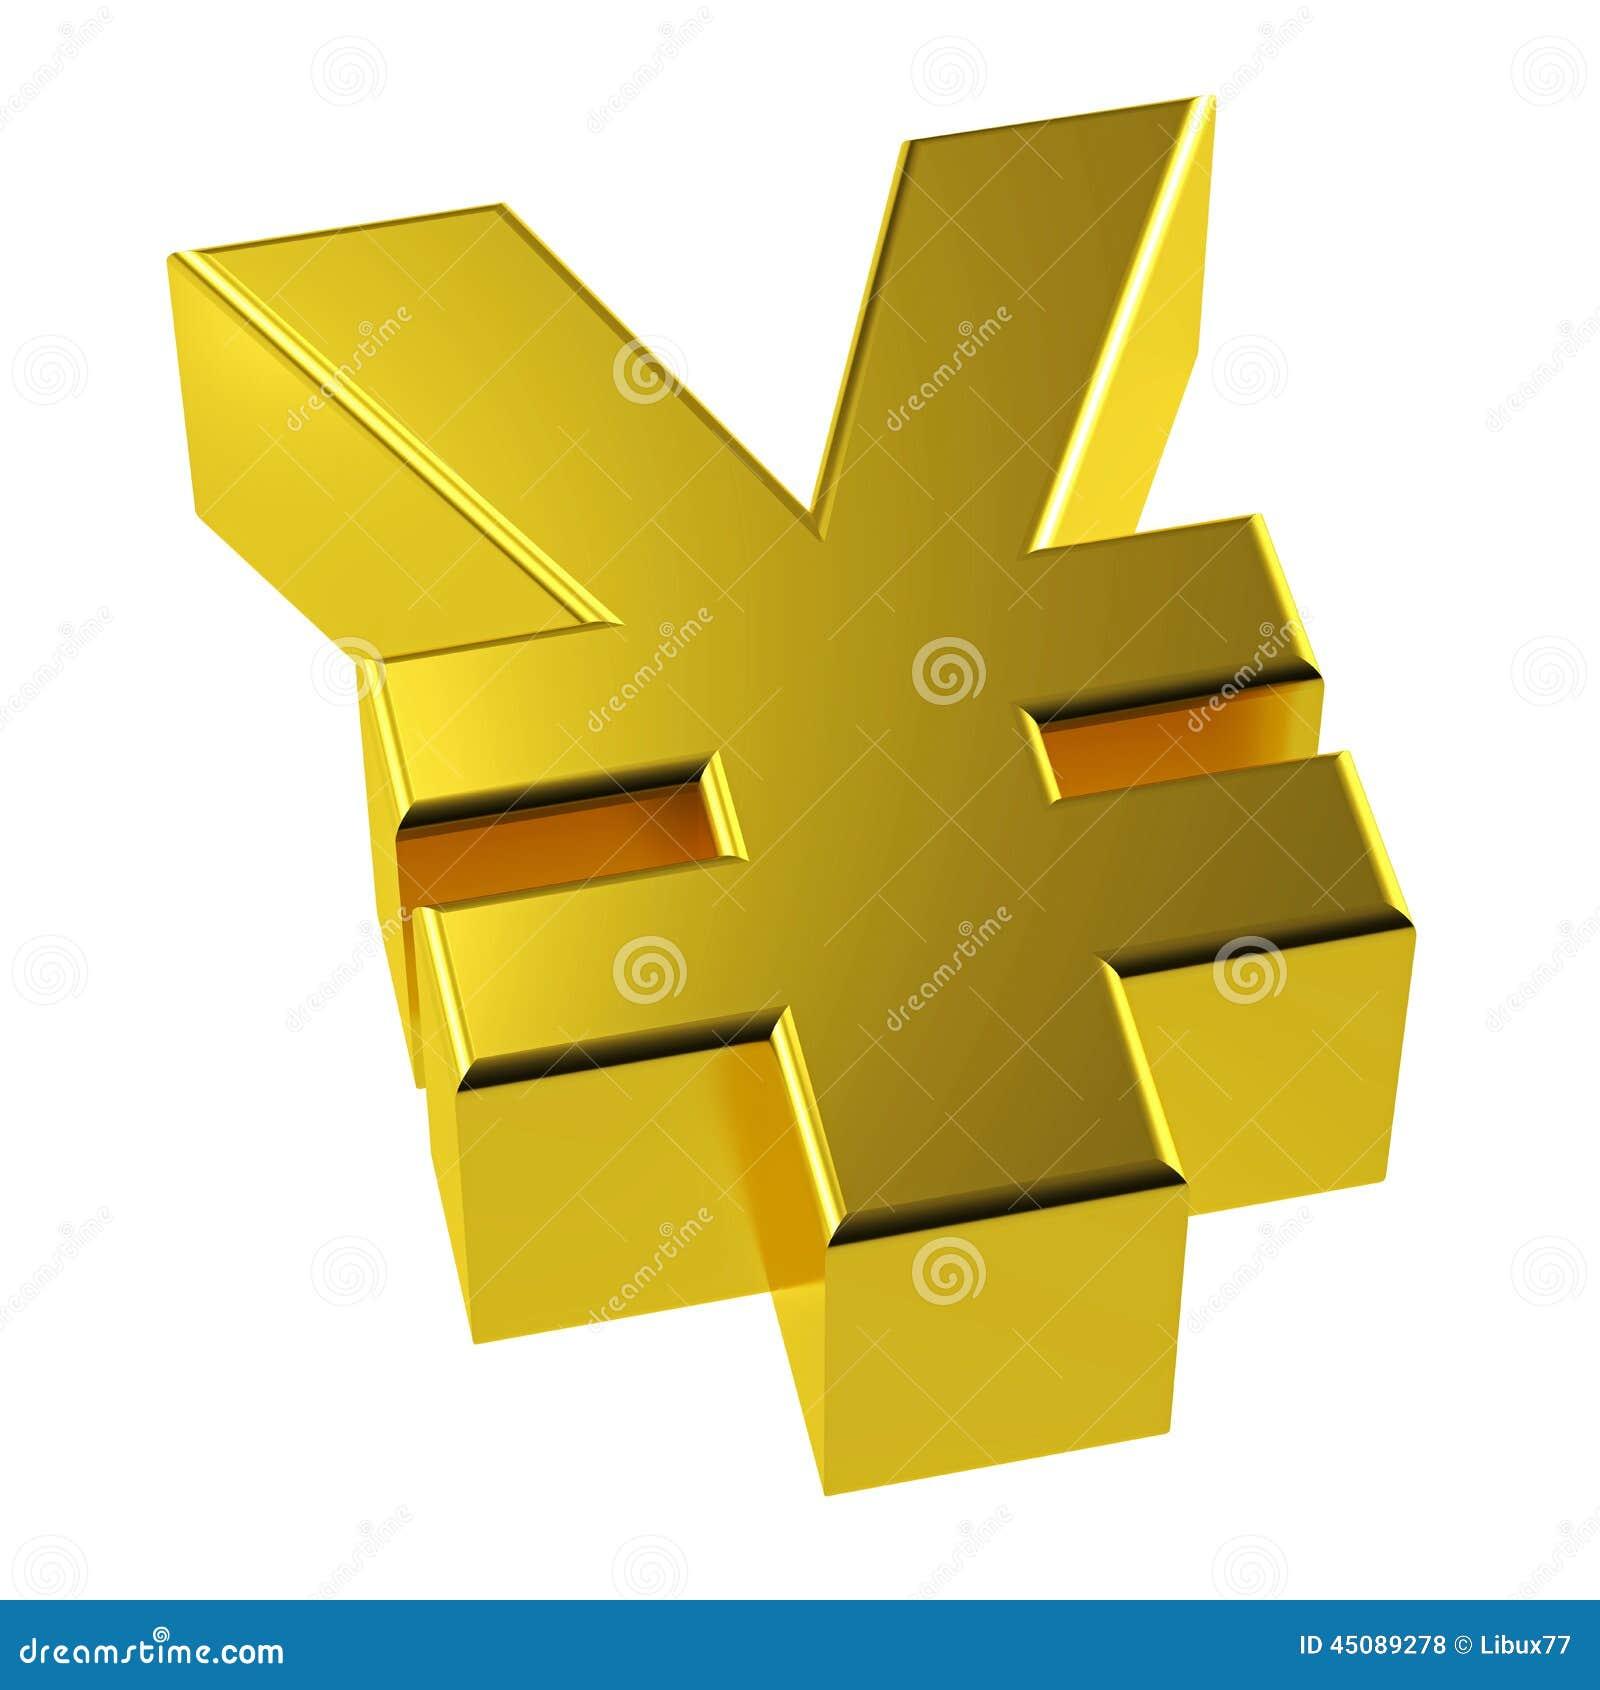 3d gold yen symbol golden japan stock illustration illustration 3d gold yen symbol golden japan biocorpaavc Choice Image